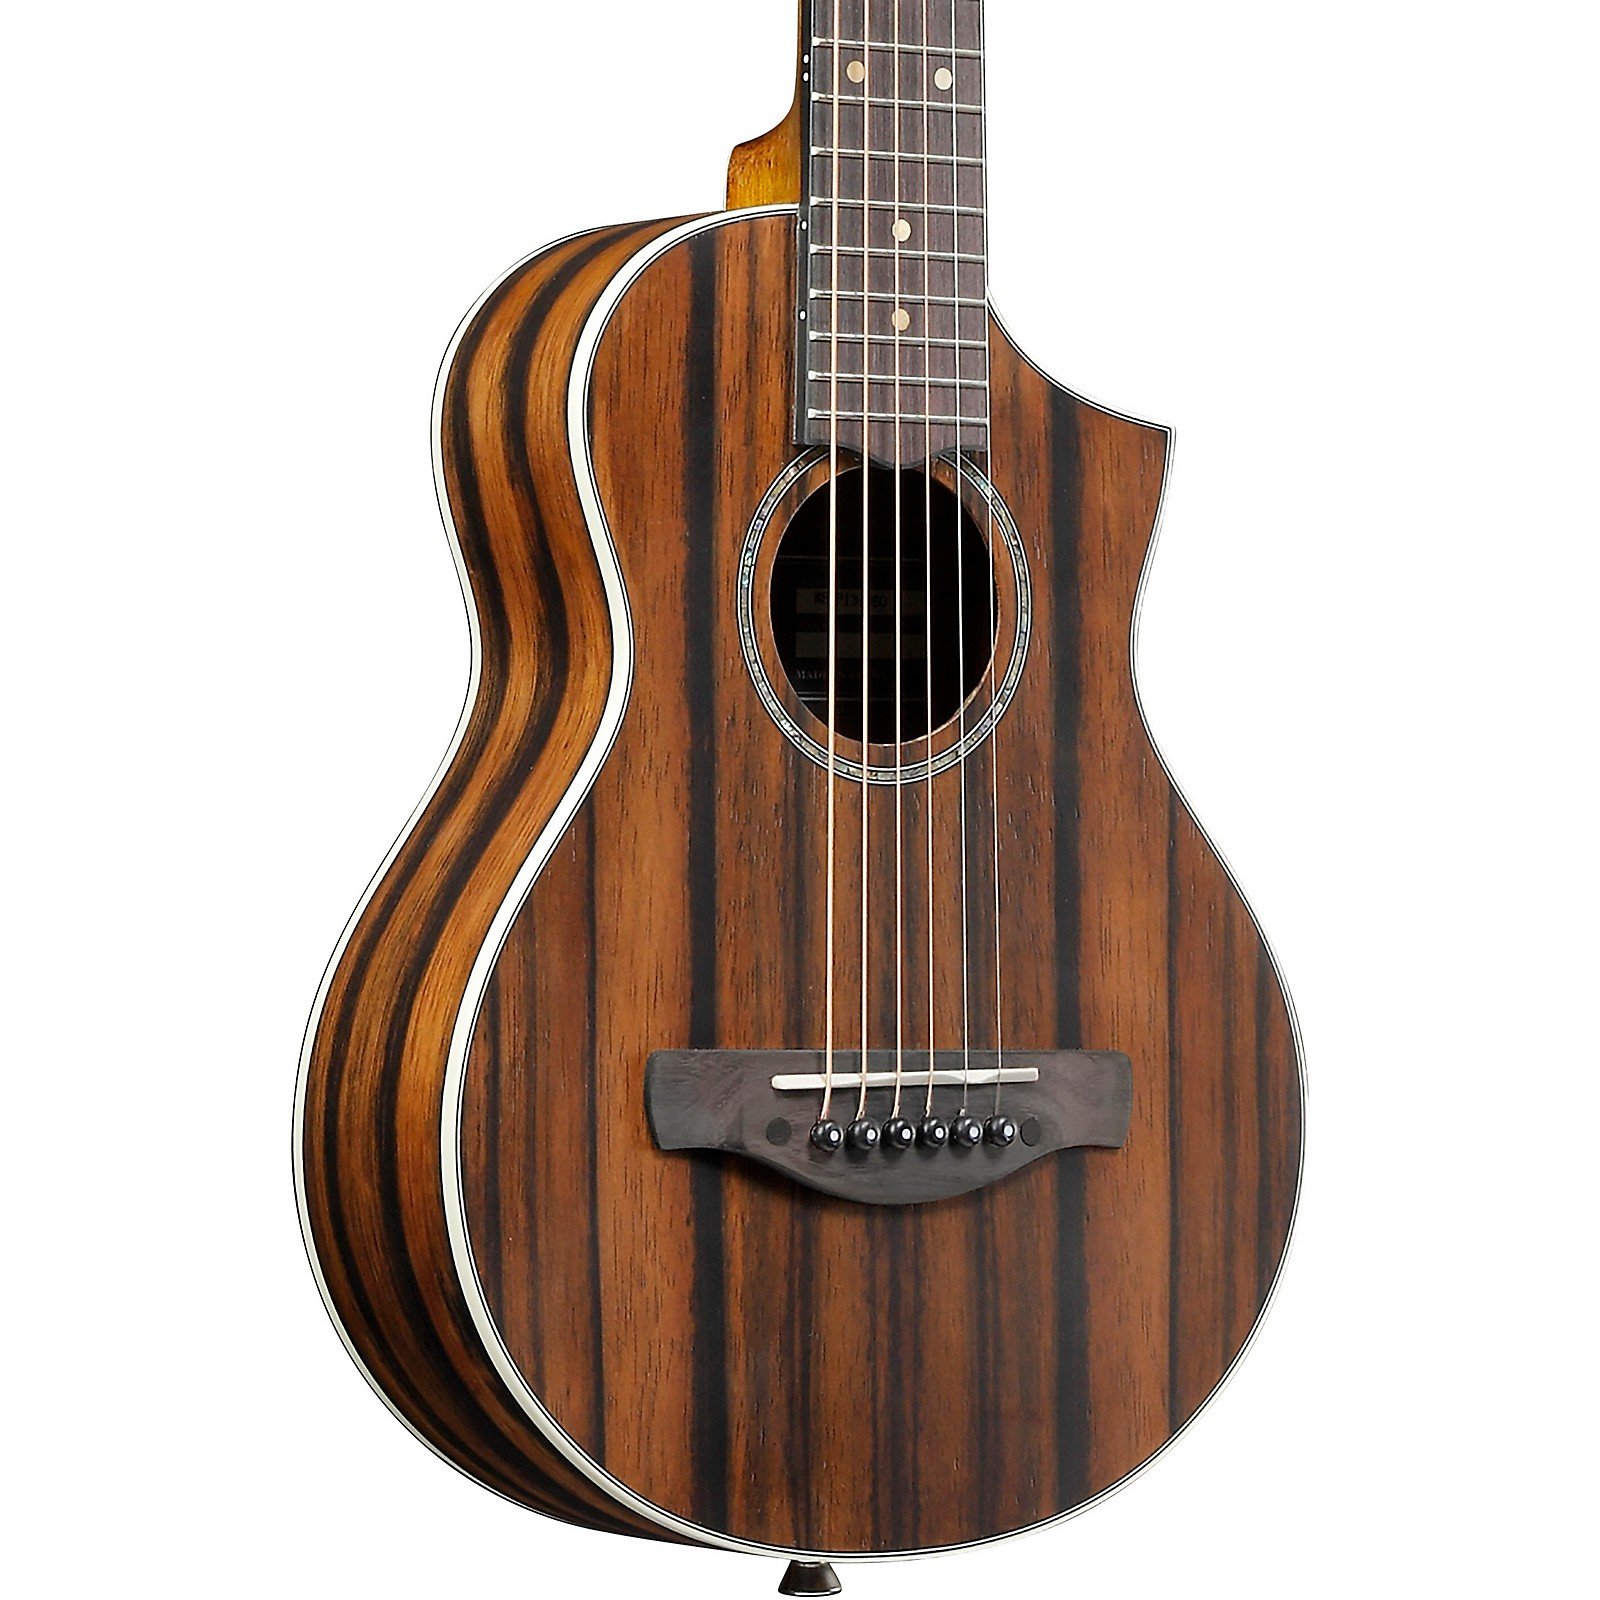 Ibanez EWP13DBO Exotic Wood Piccolo Acoustic Guitar